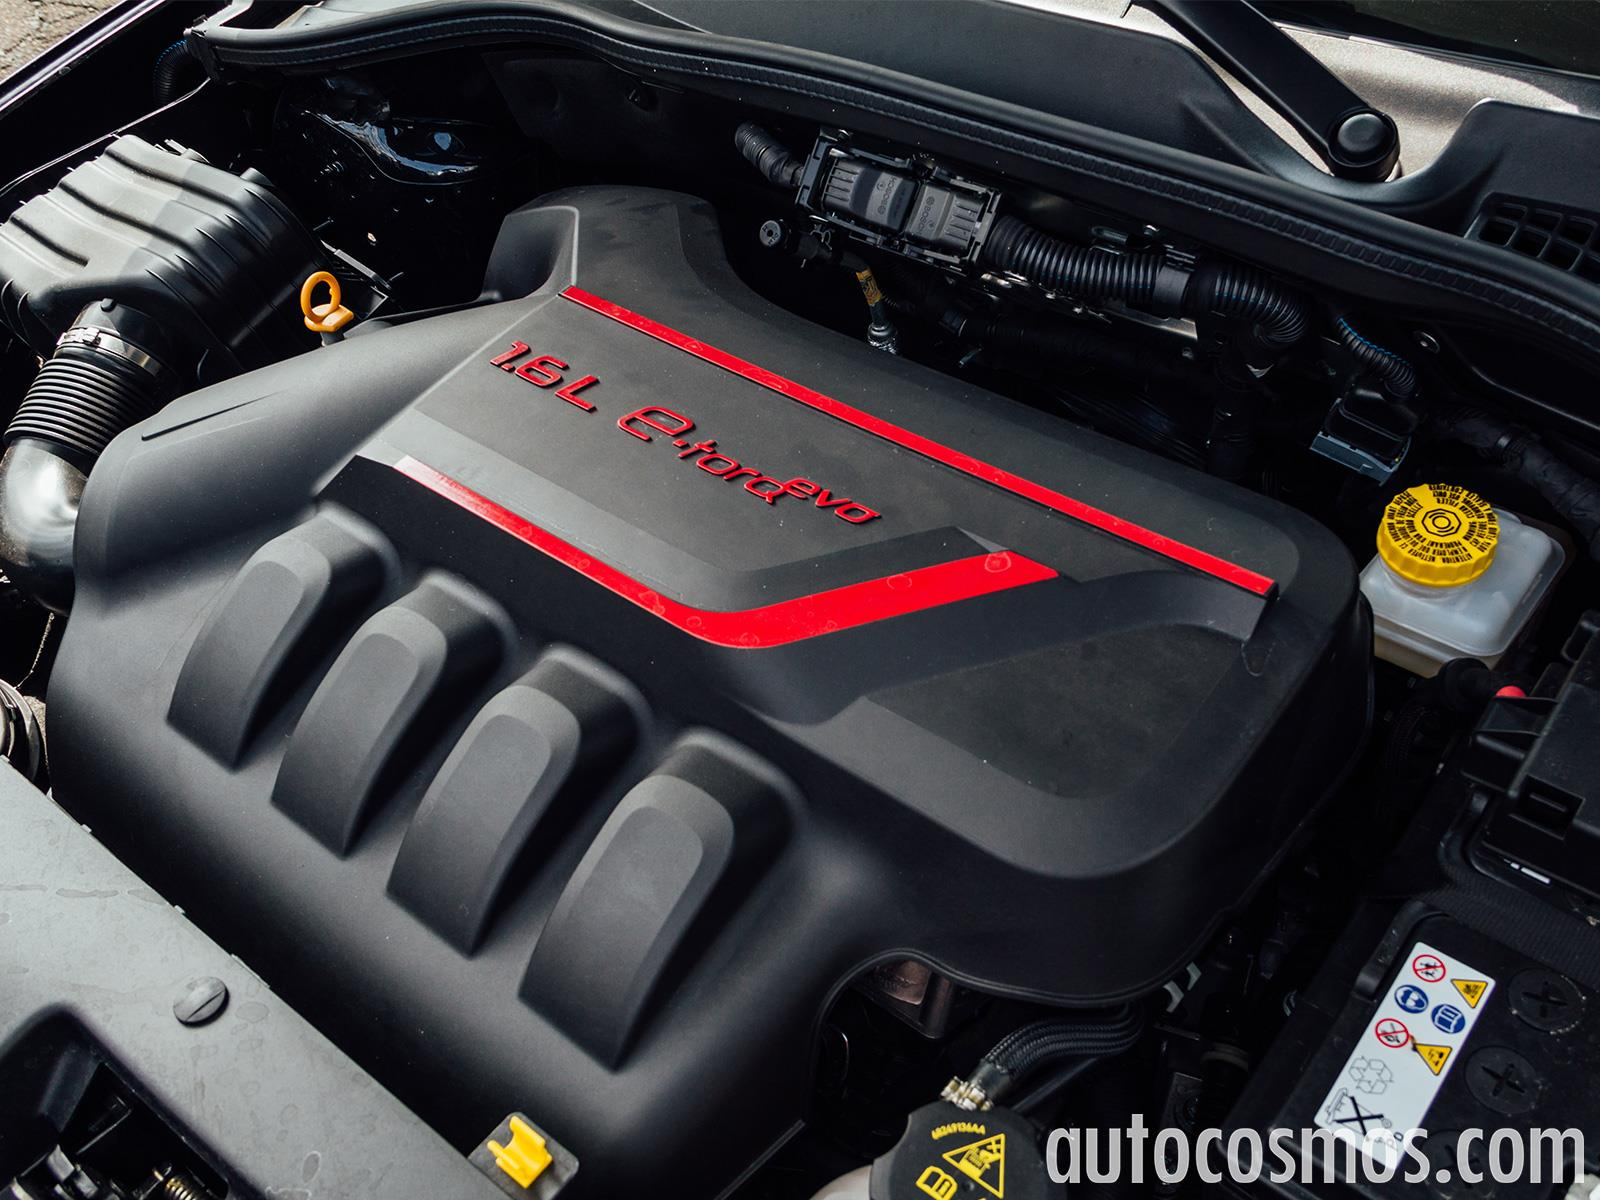 2017 Dodge Neon Interior | 2017 - 2018 Best Cars Reviews